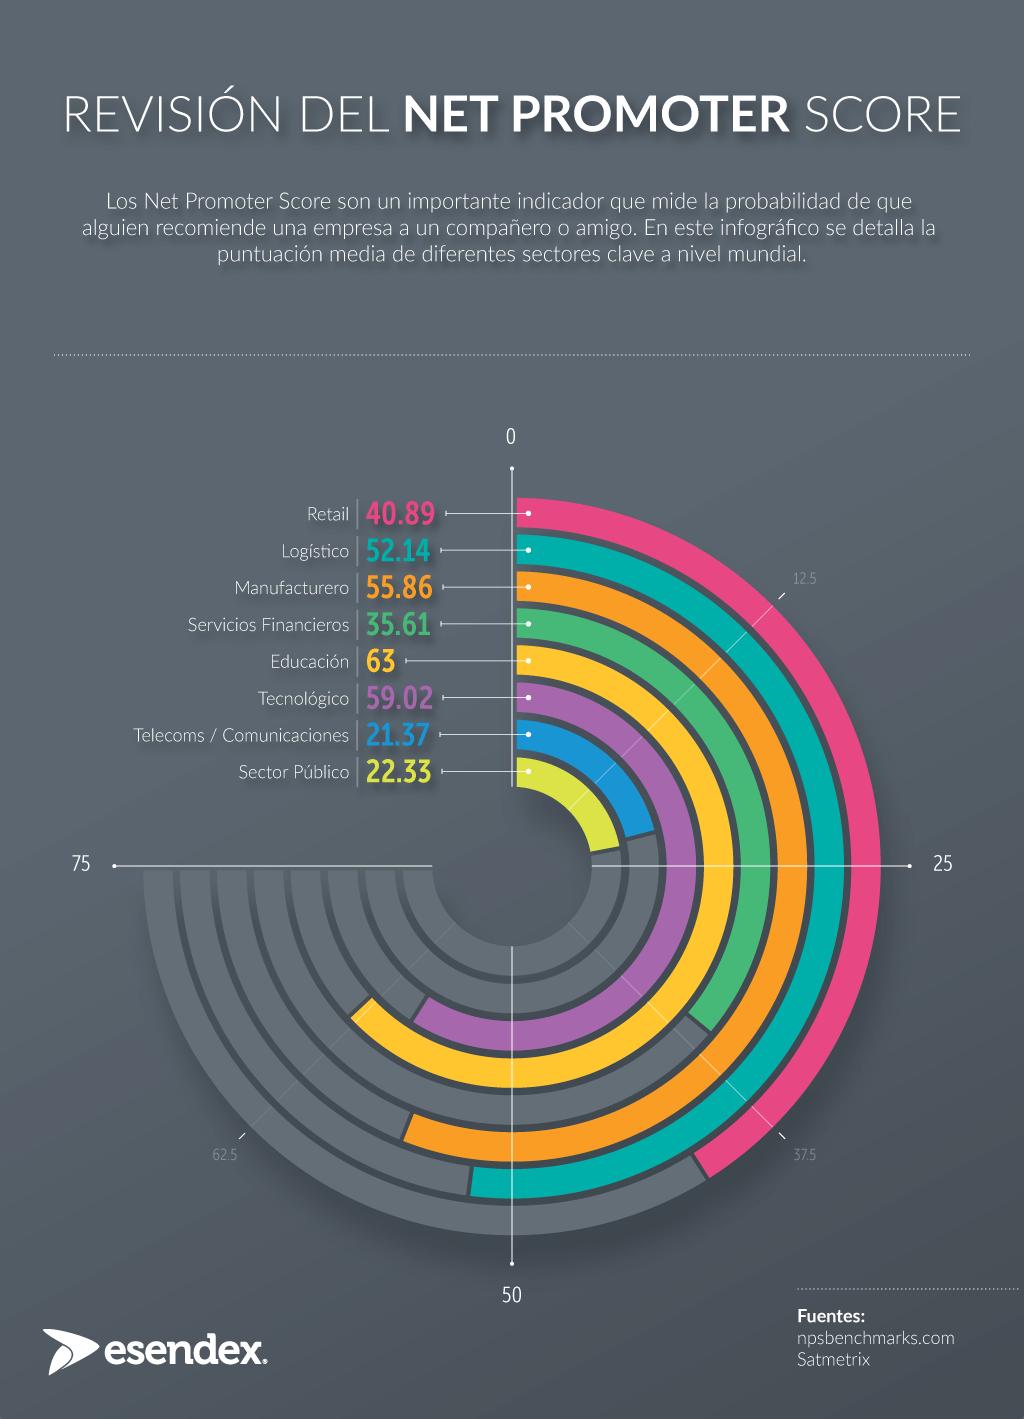 Net Promoter Score parámetros de la industria